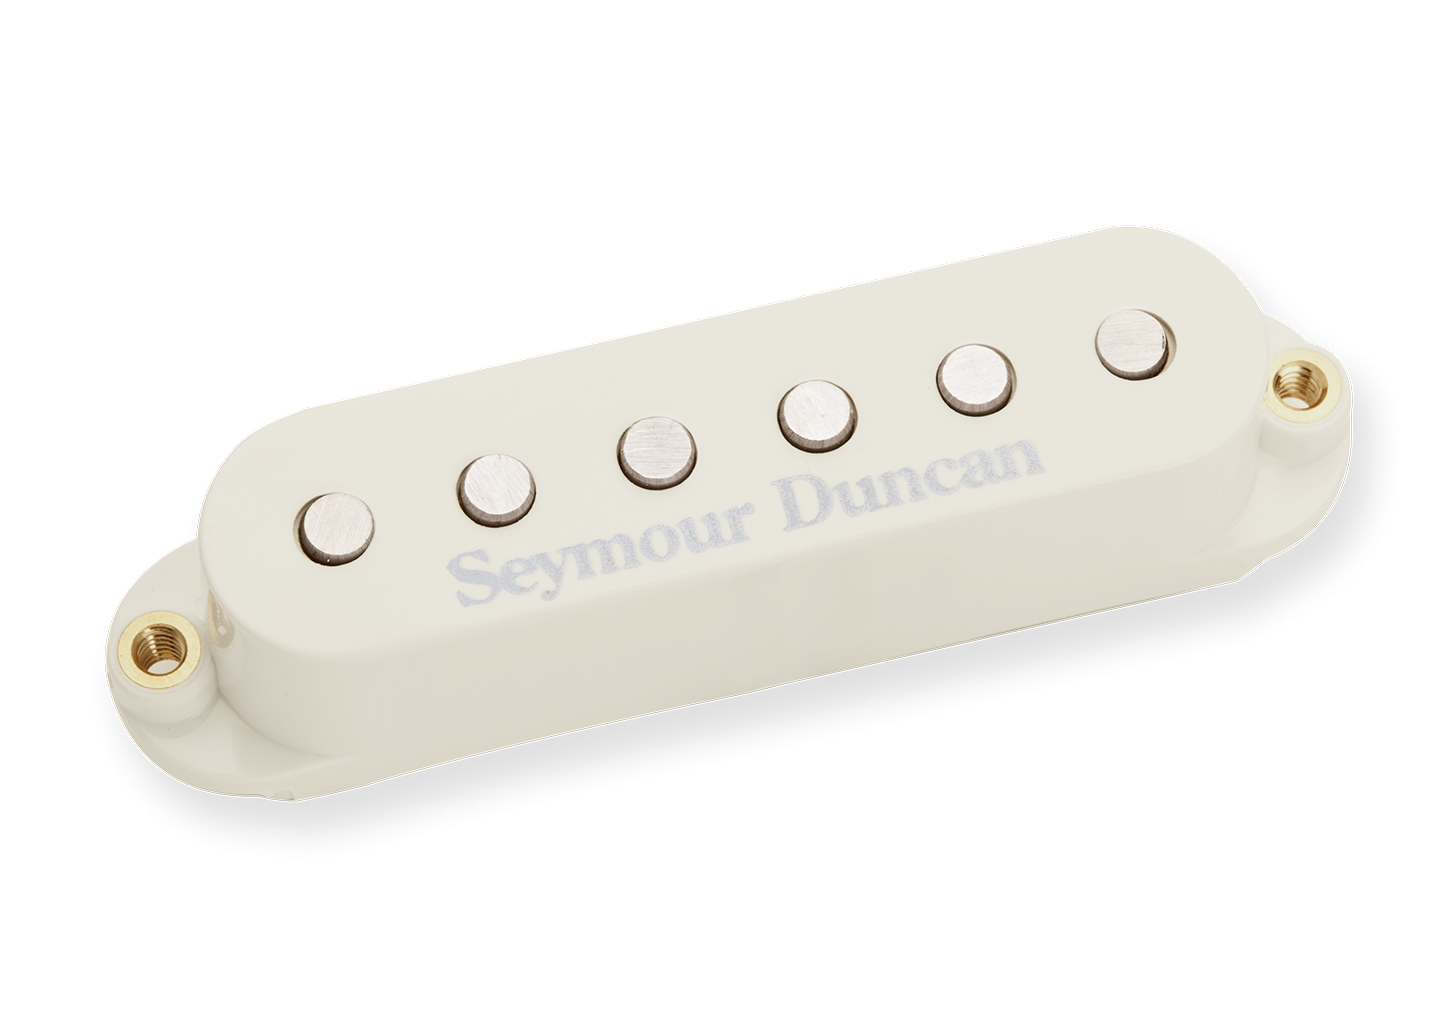 Seymour Duncan Hot Stack Plus Strat STK-S9B Bridge - Parchment